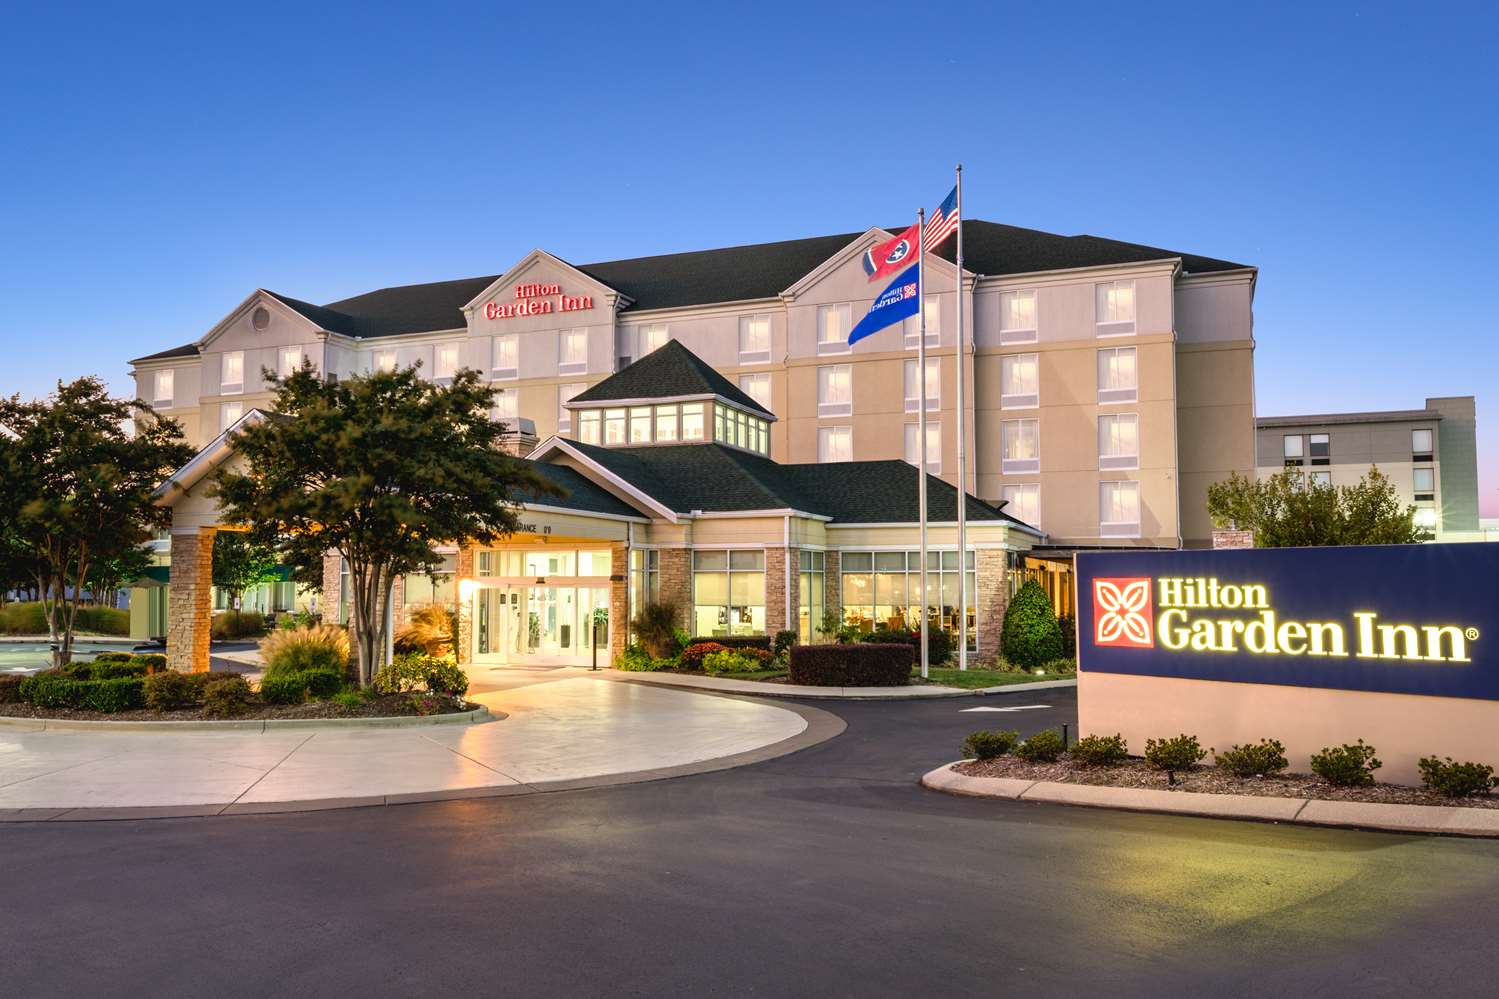 Hilton Garden Inn Chattanooga-Hamilton Place